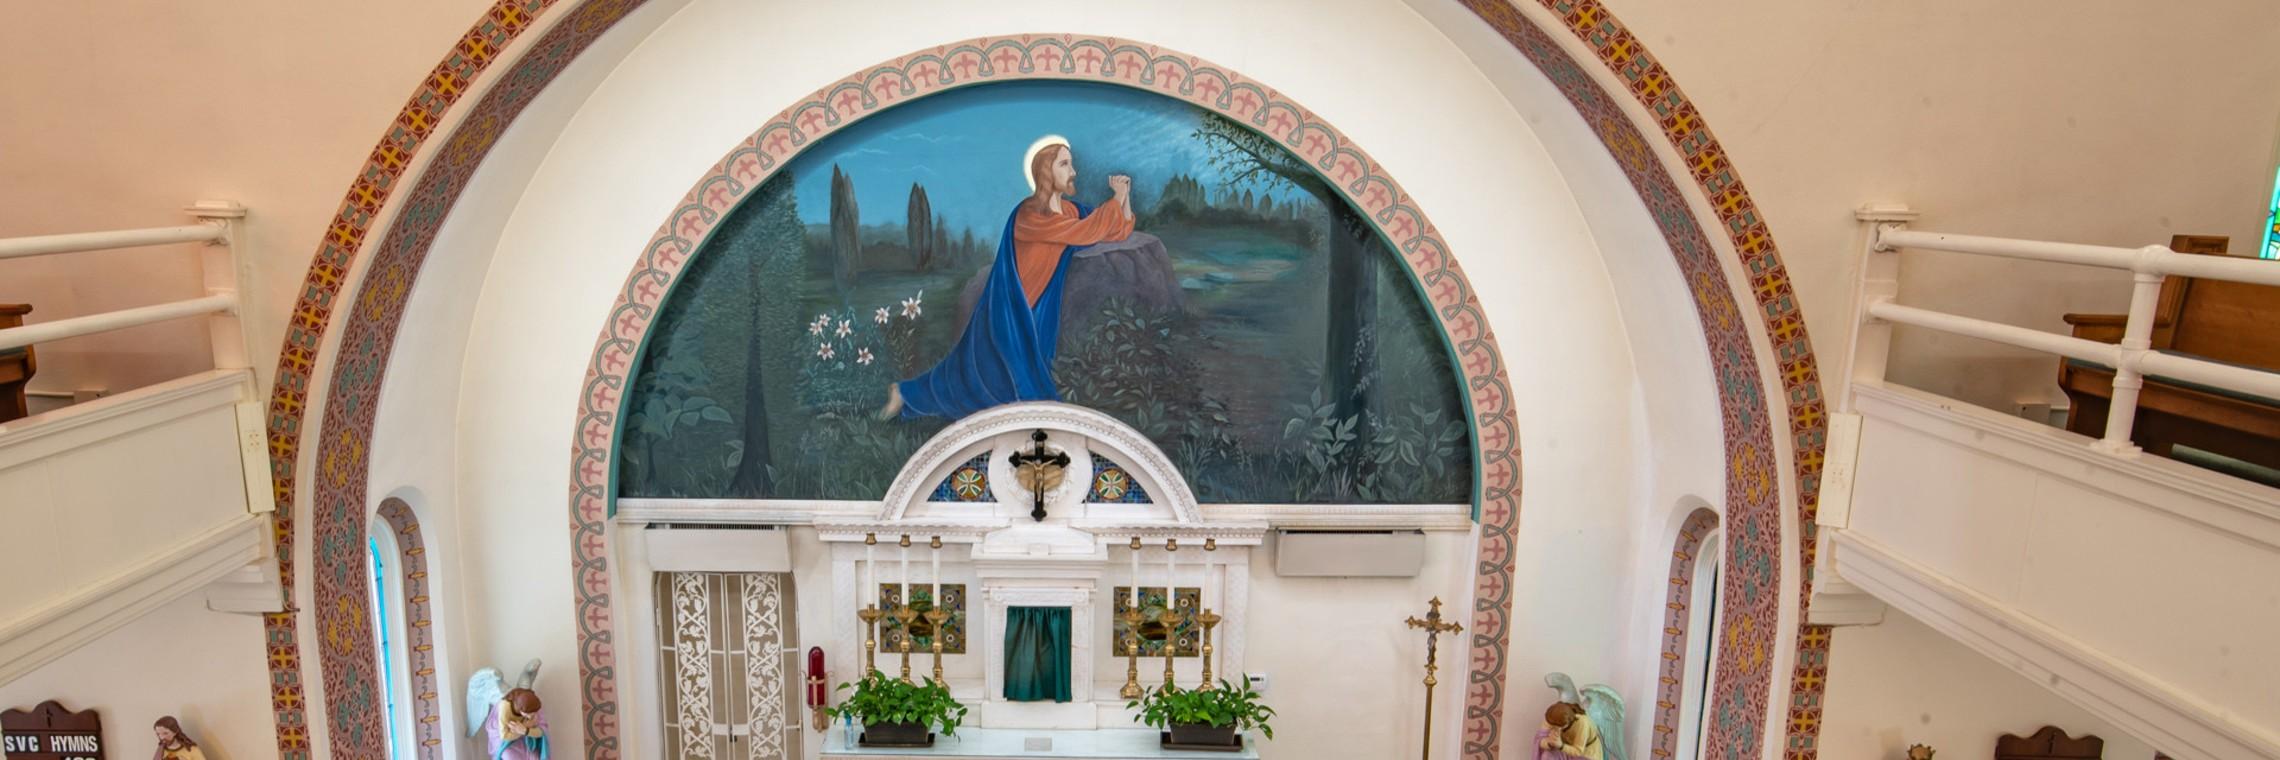 Church Altar 1920 X 1080